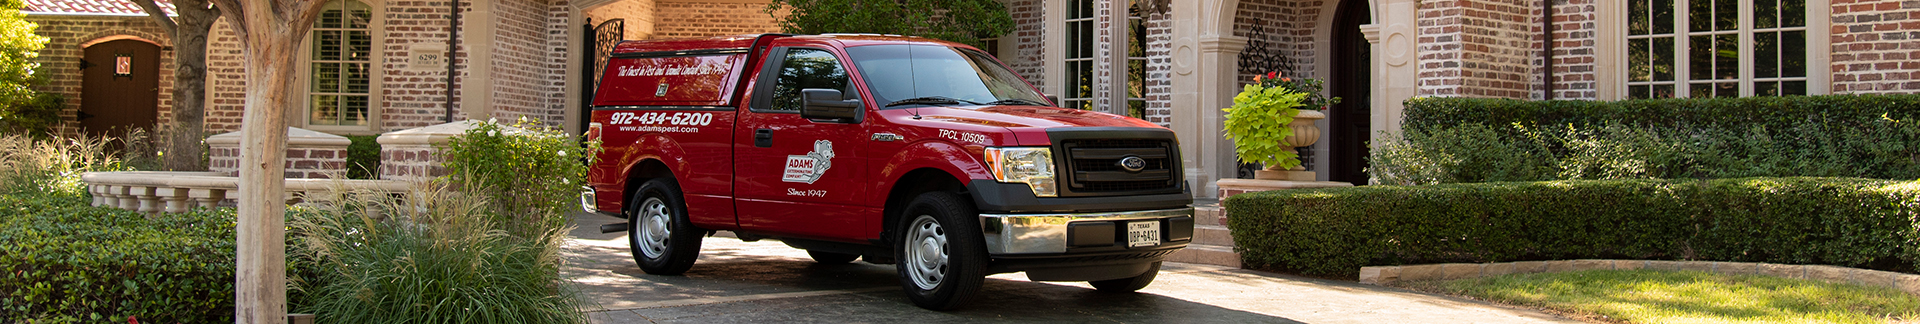 adams pest control's truck in highland village texas